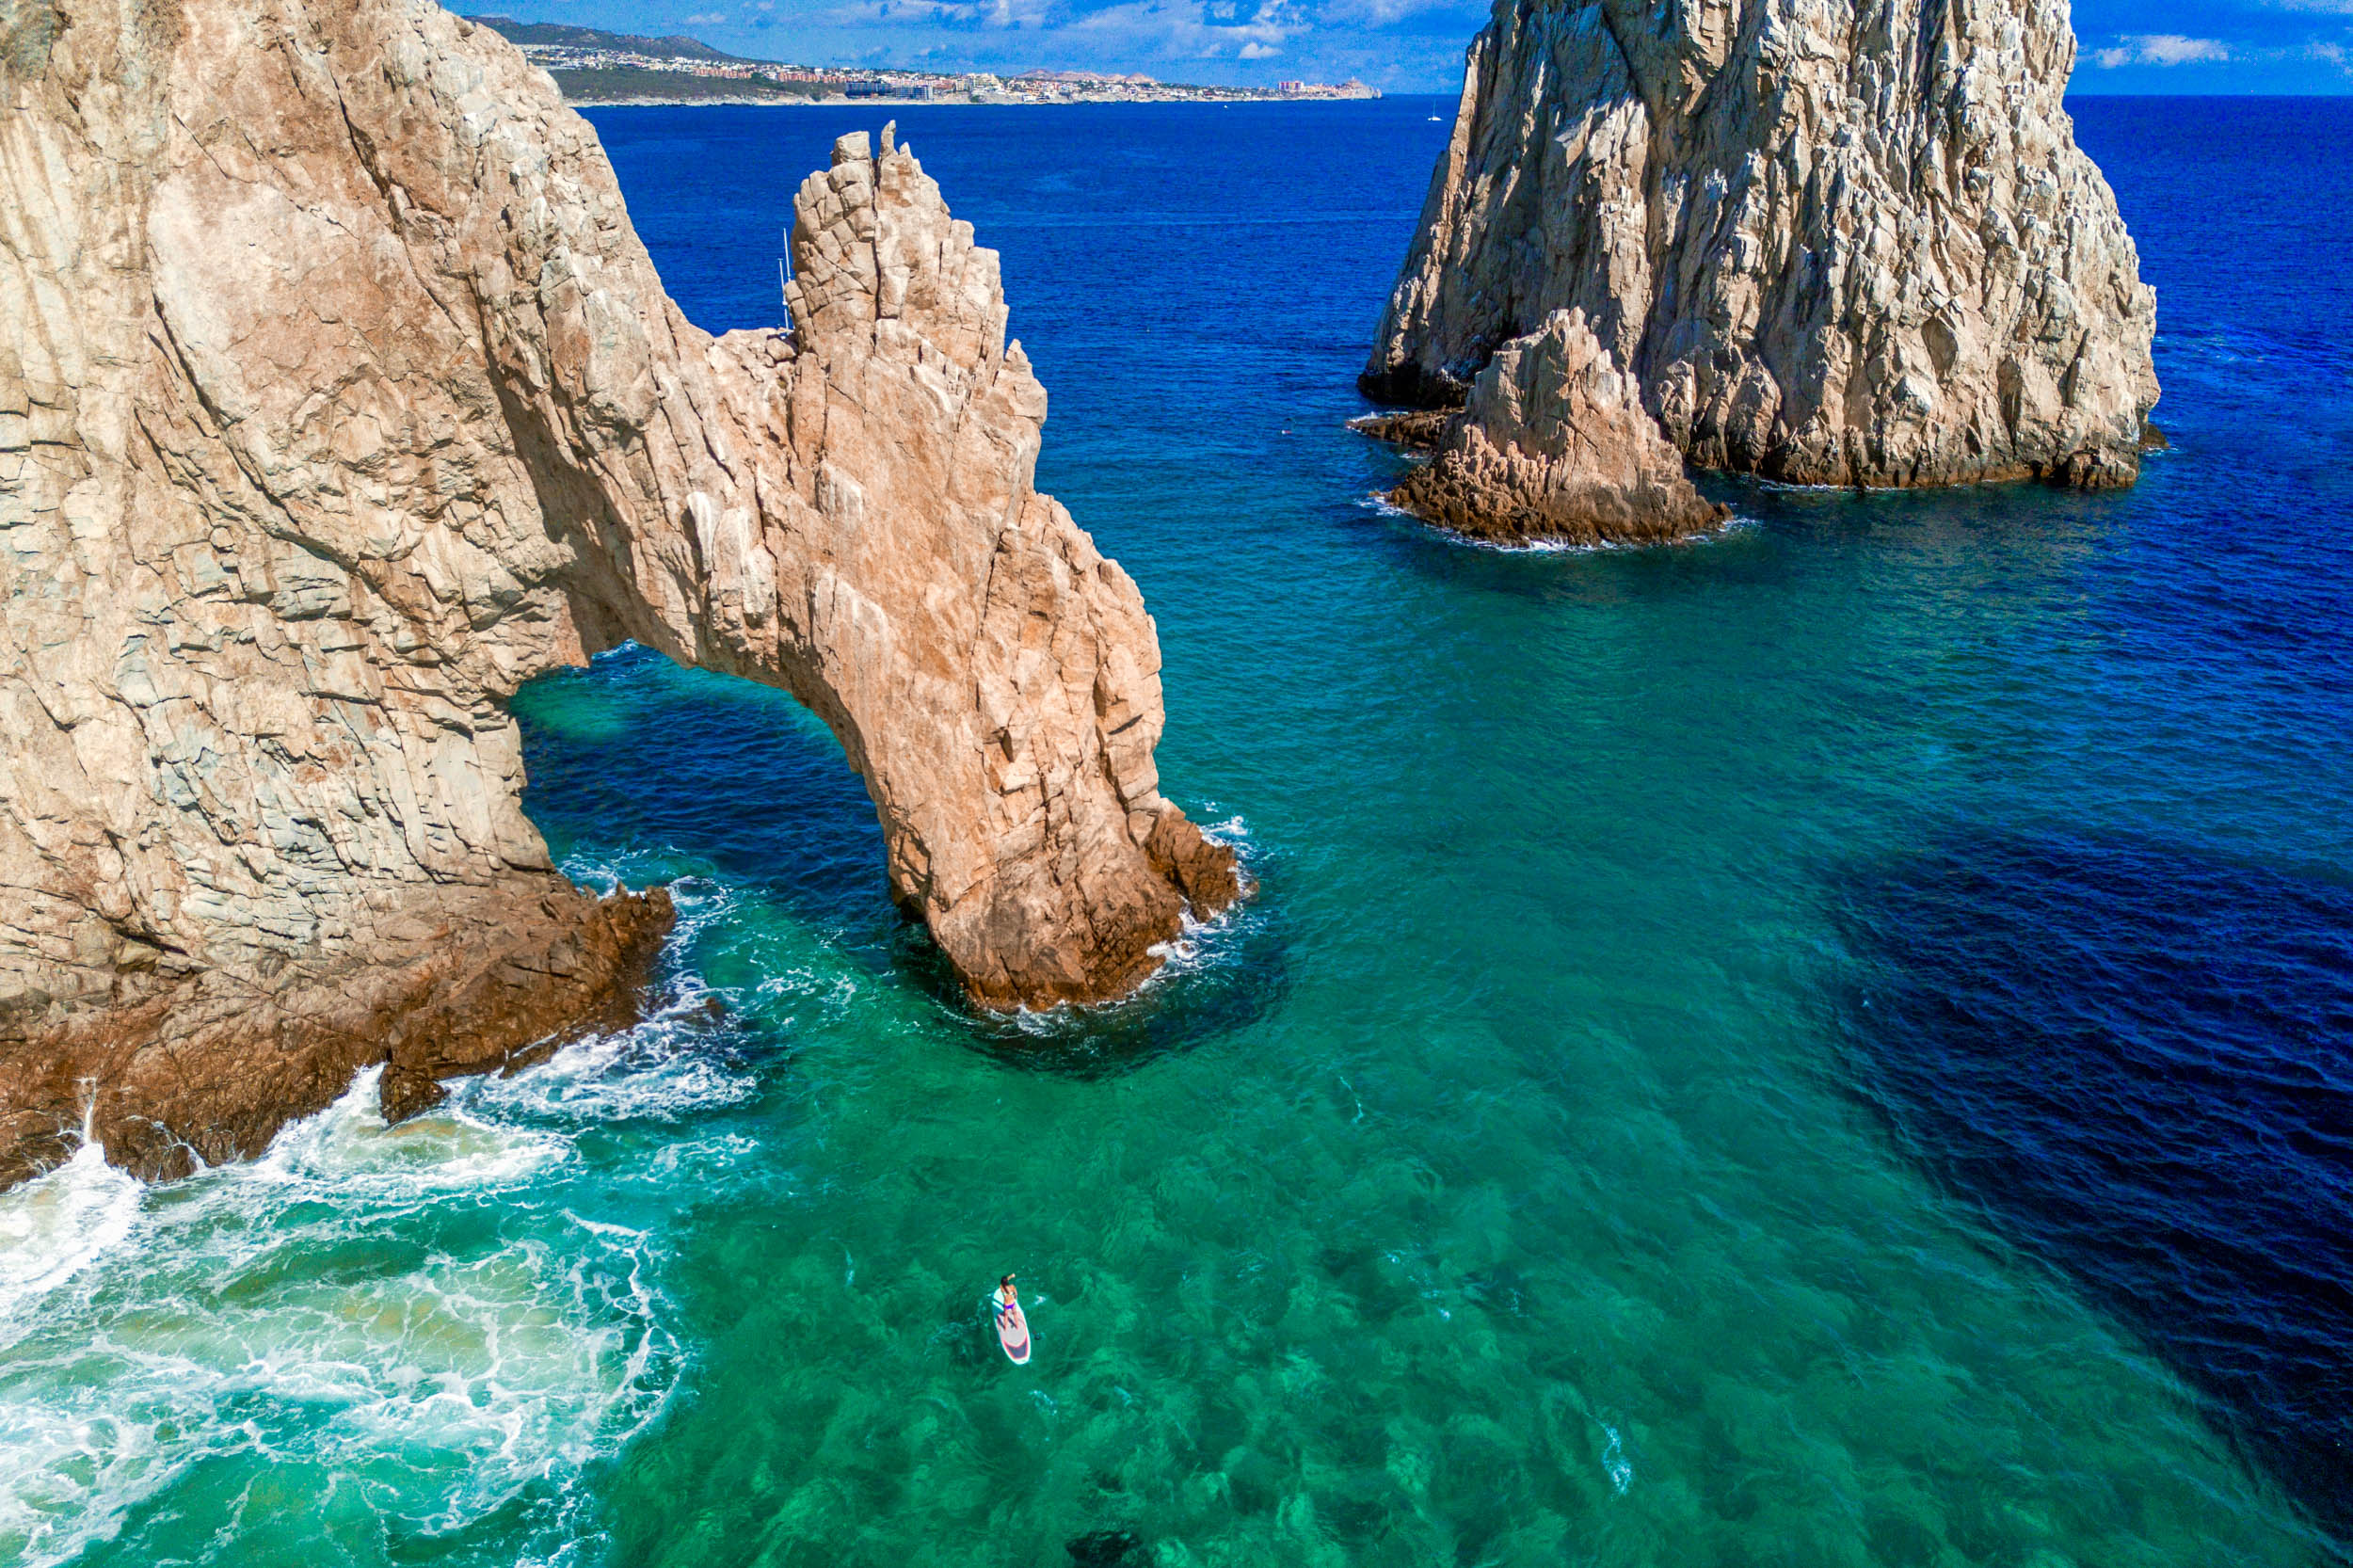 The Bahia Hotel and Beach club - Cabo San Lucas